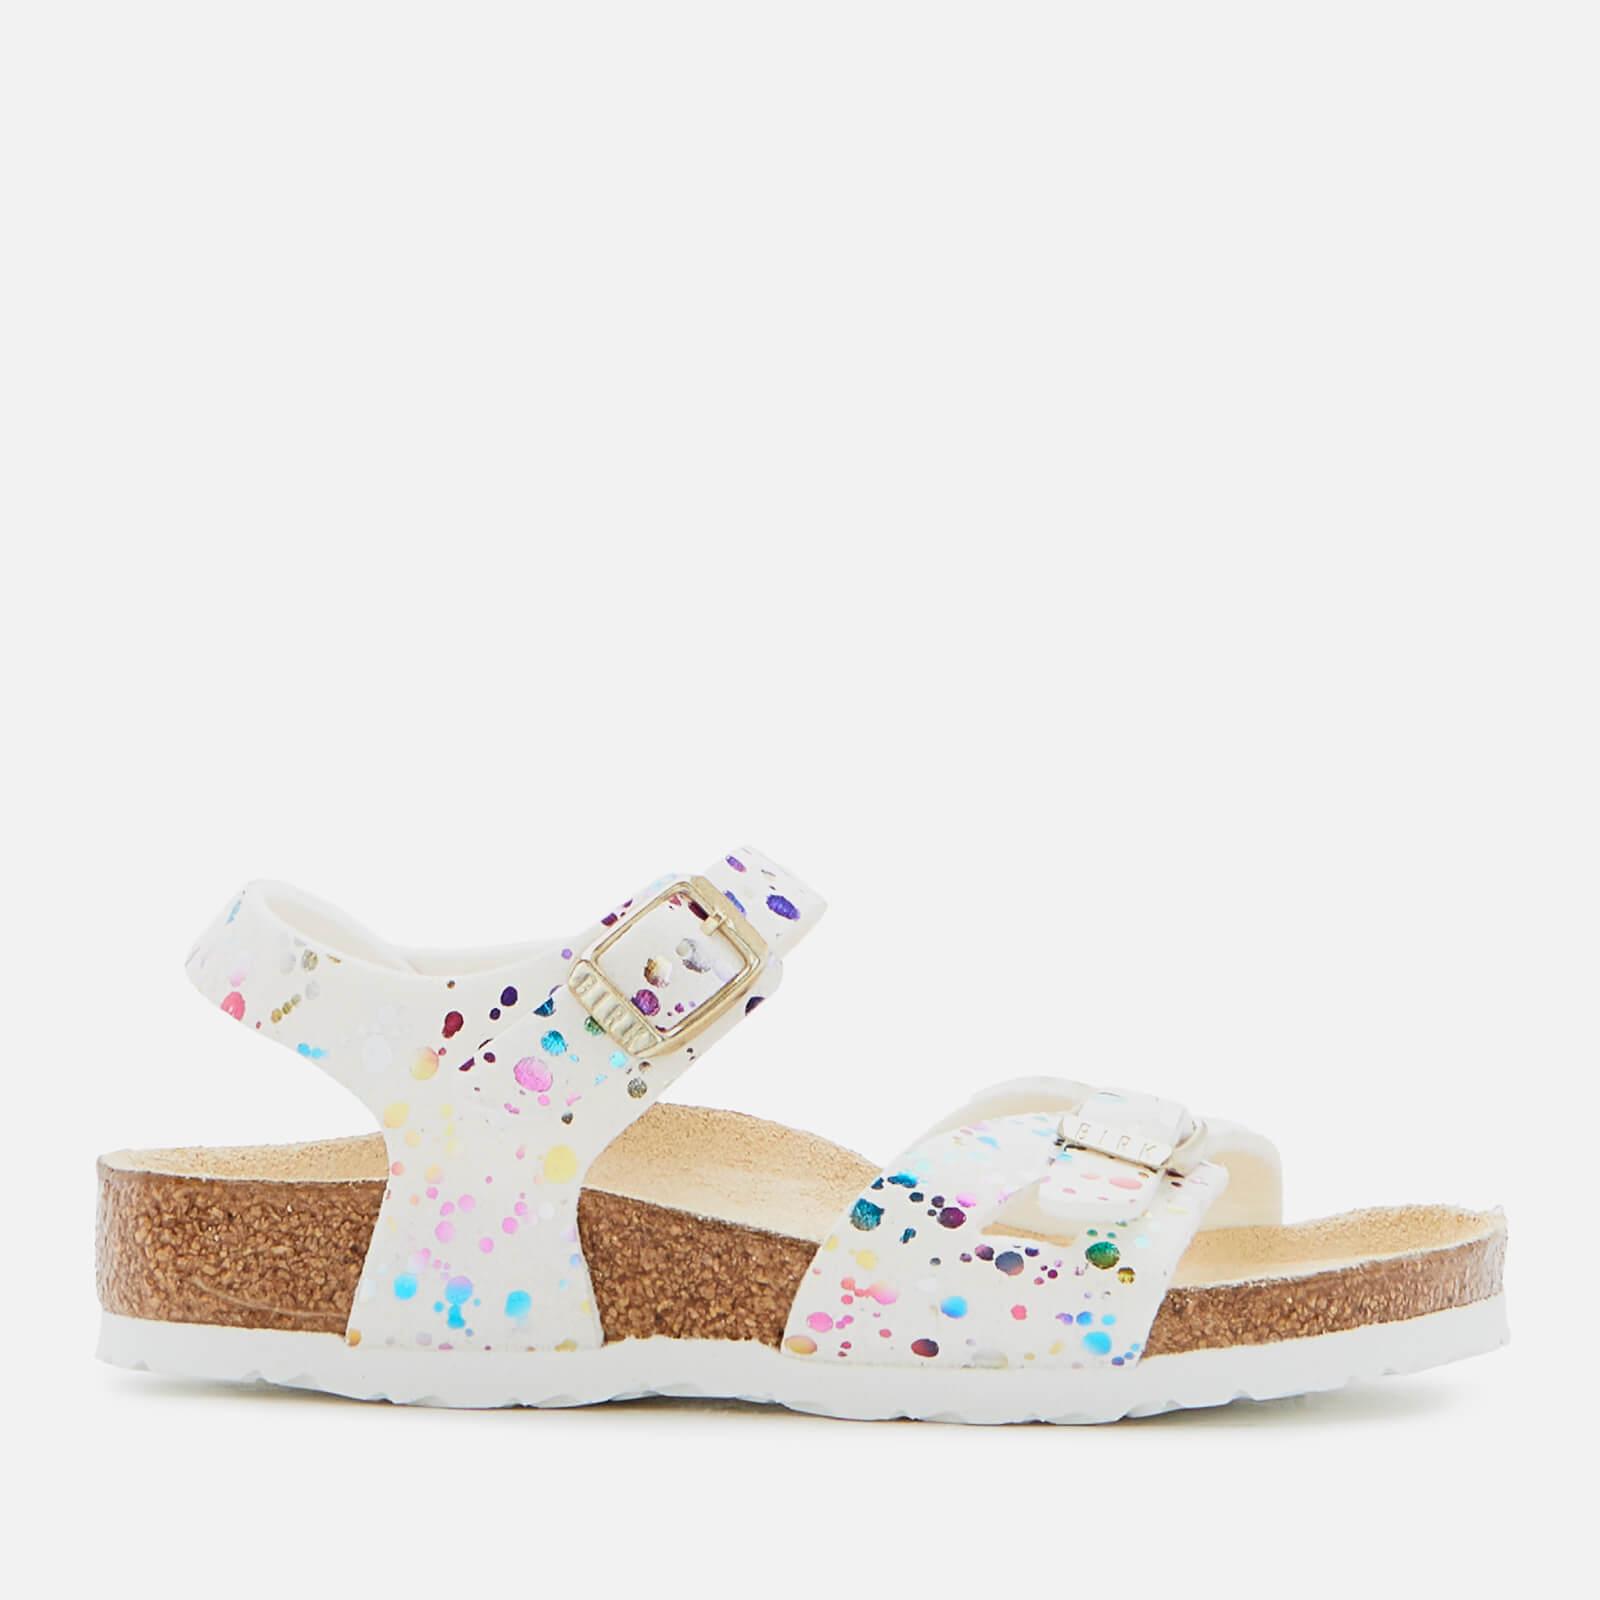 Birkenstock Rio Kids' Sandals - Confetti White - UK 9 Kids